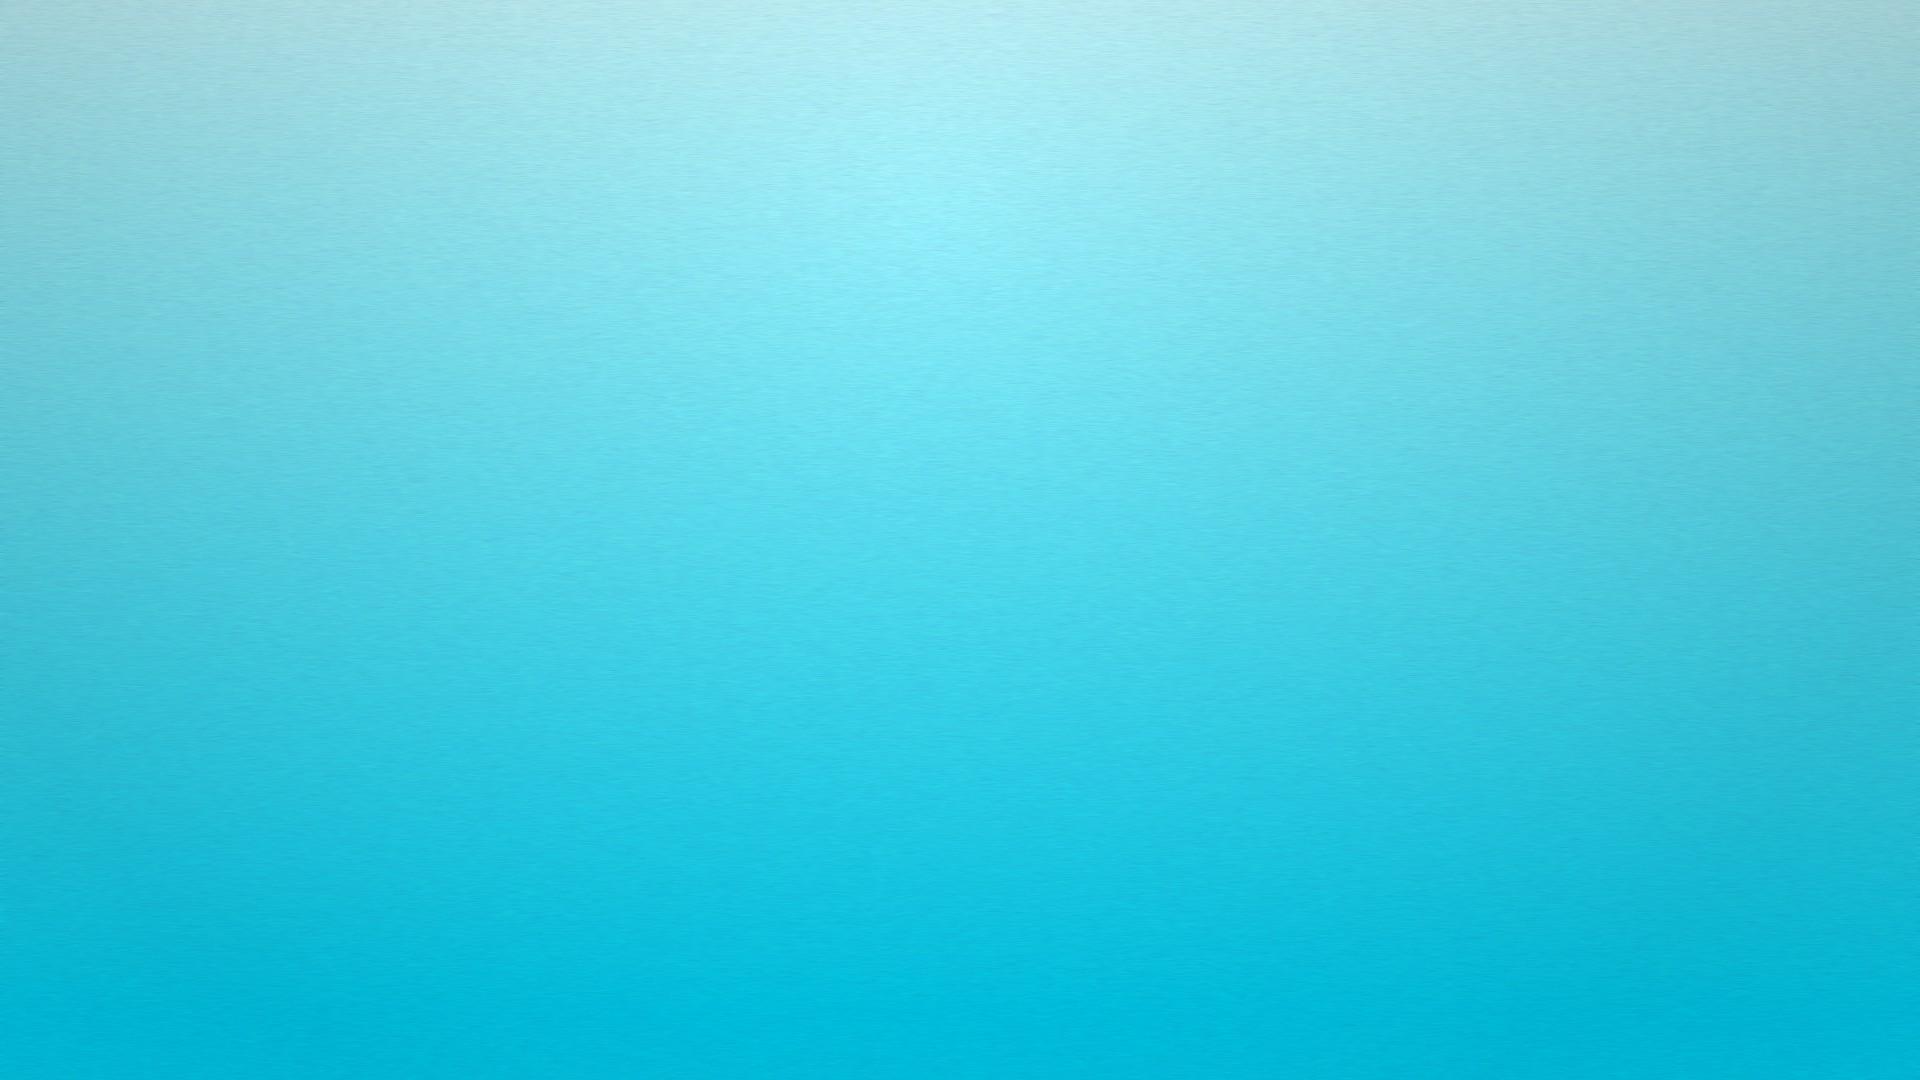 Plain Background 4K Ultra